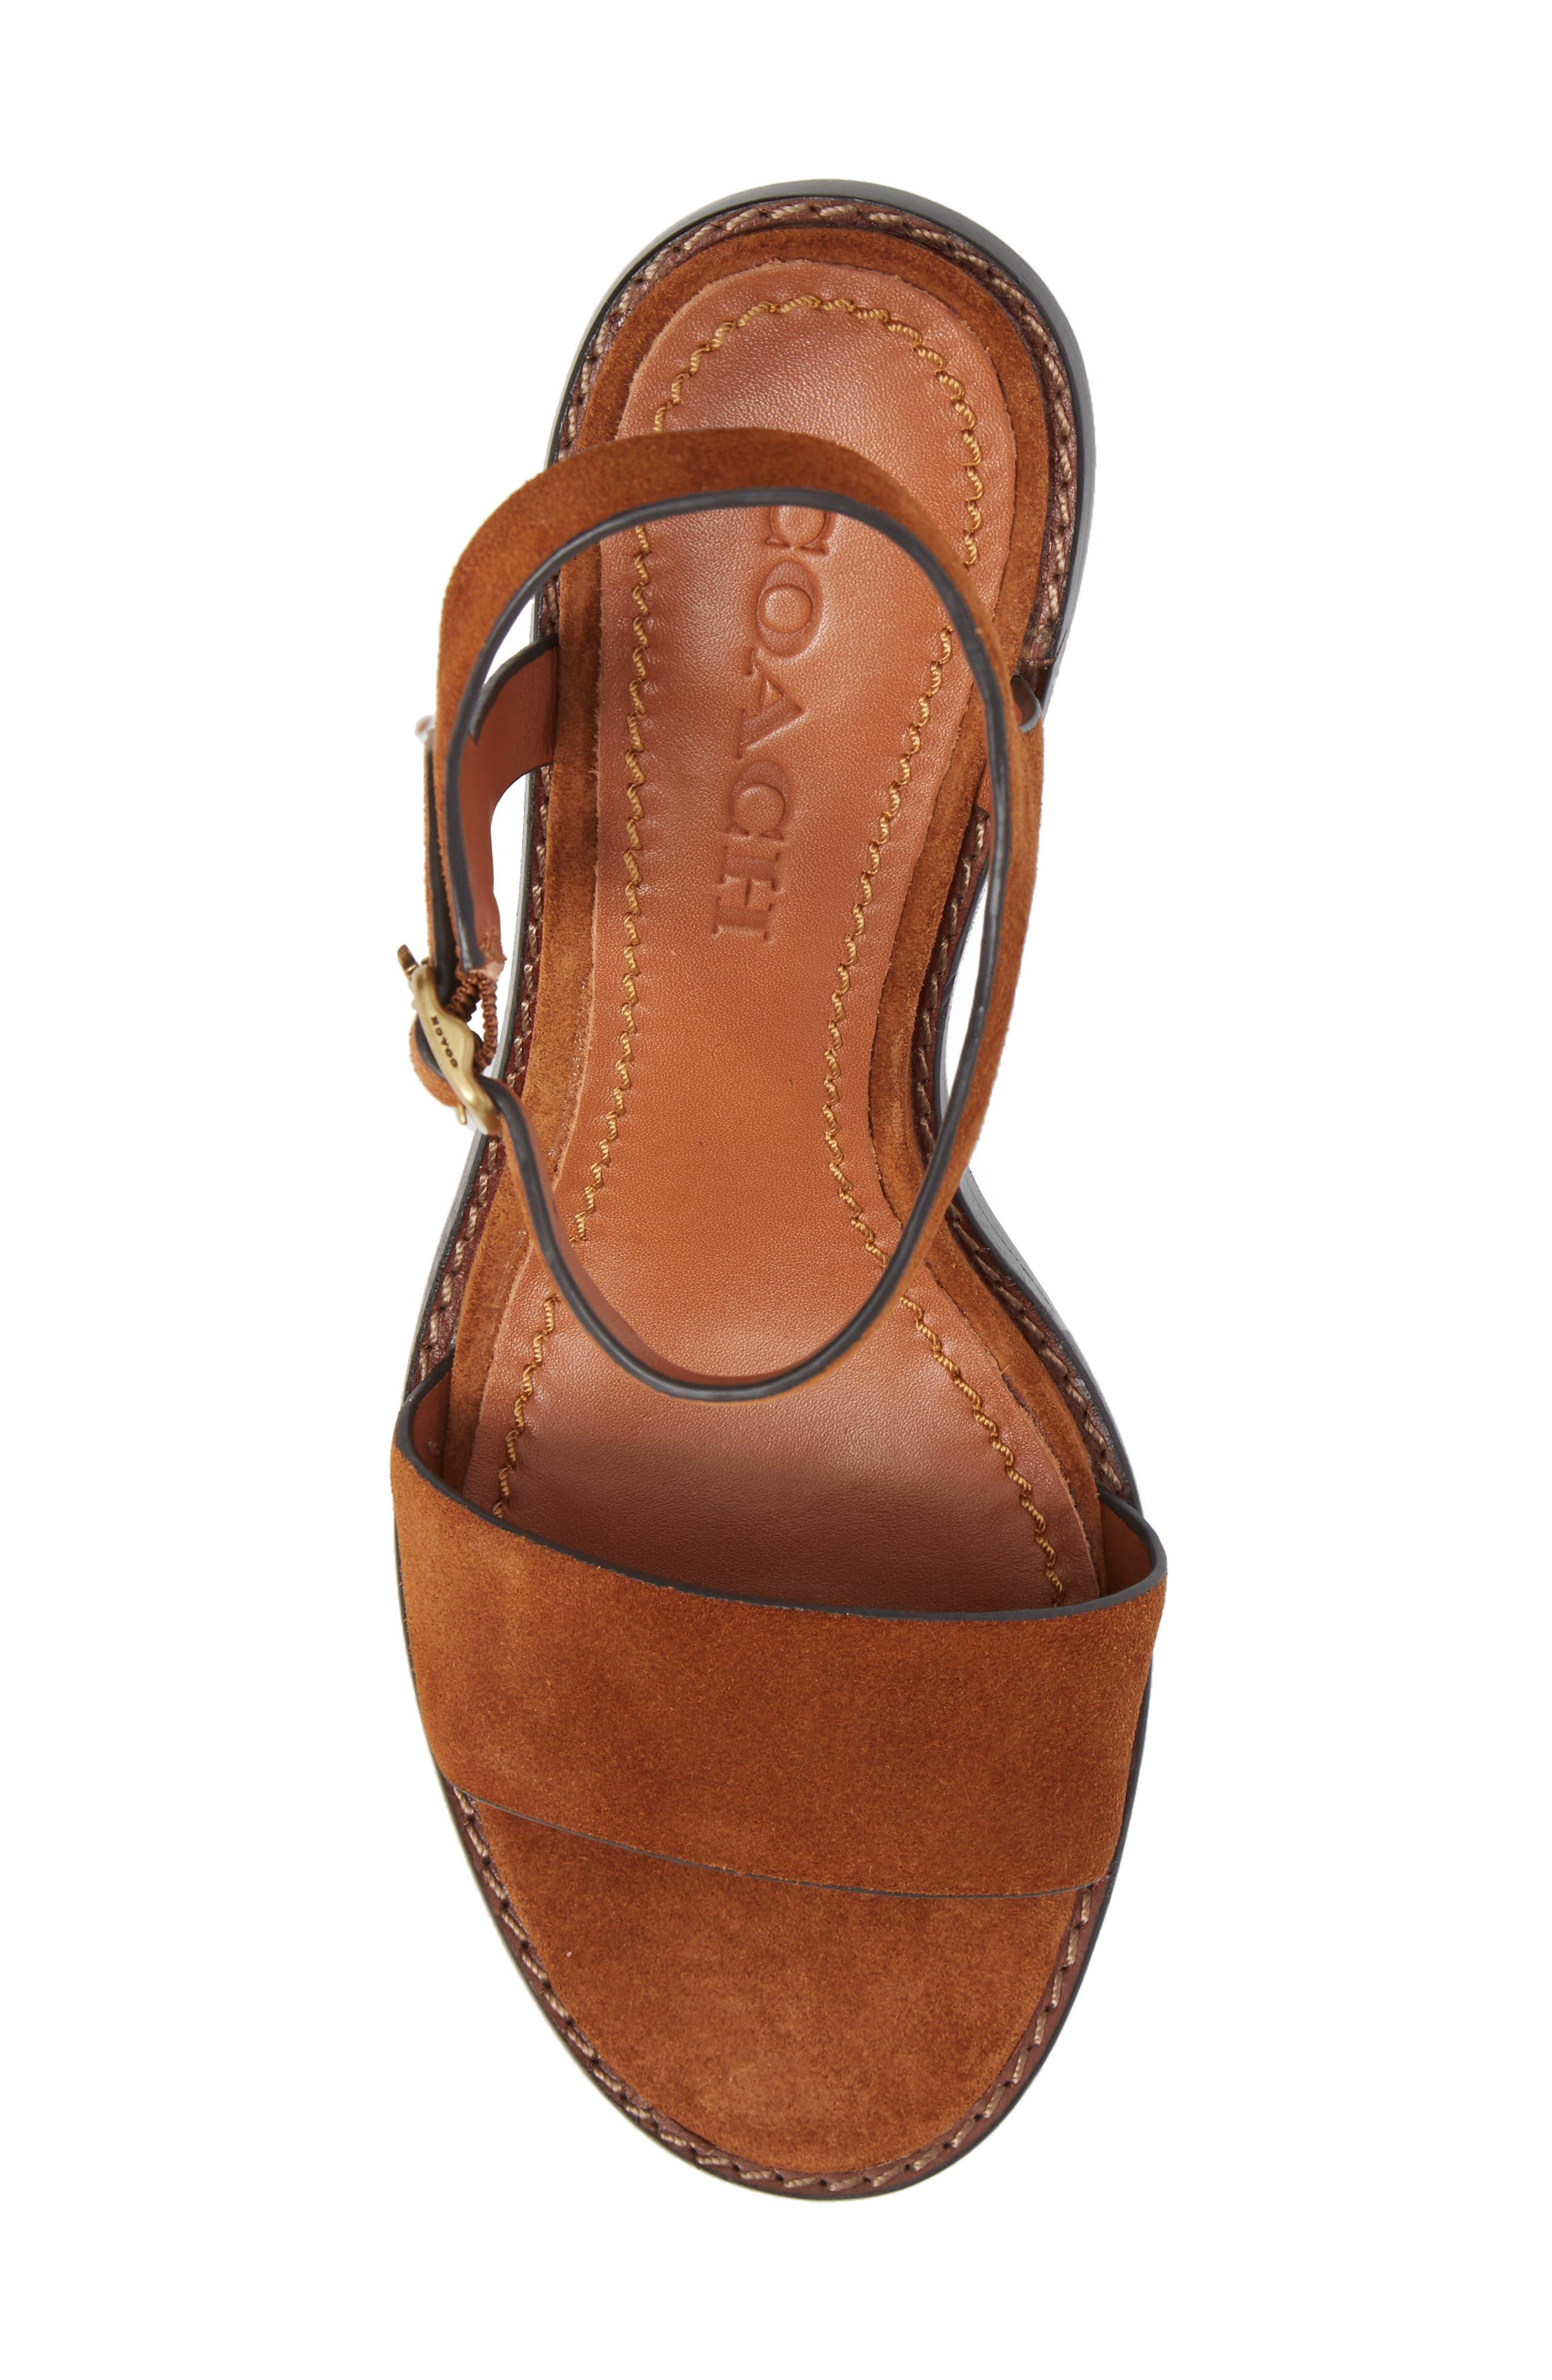 Column Heel Sandal,                             Alternate thumbnail 5, color,                             Saddle Suede